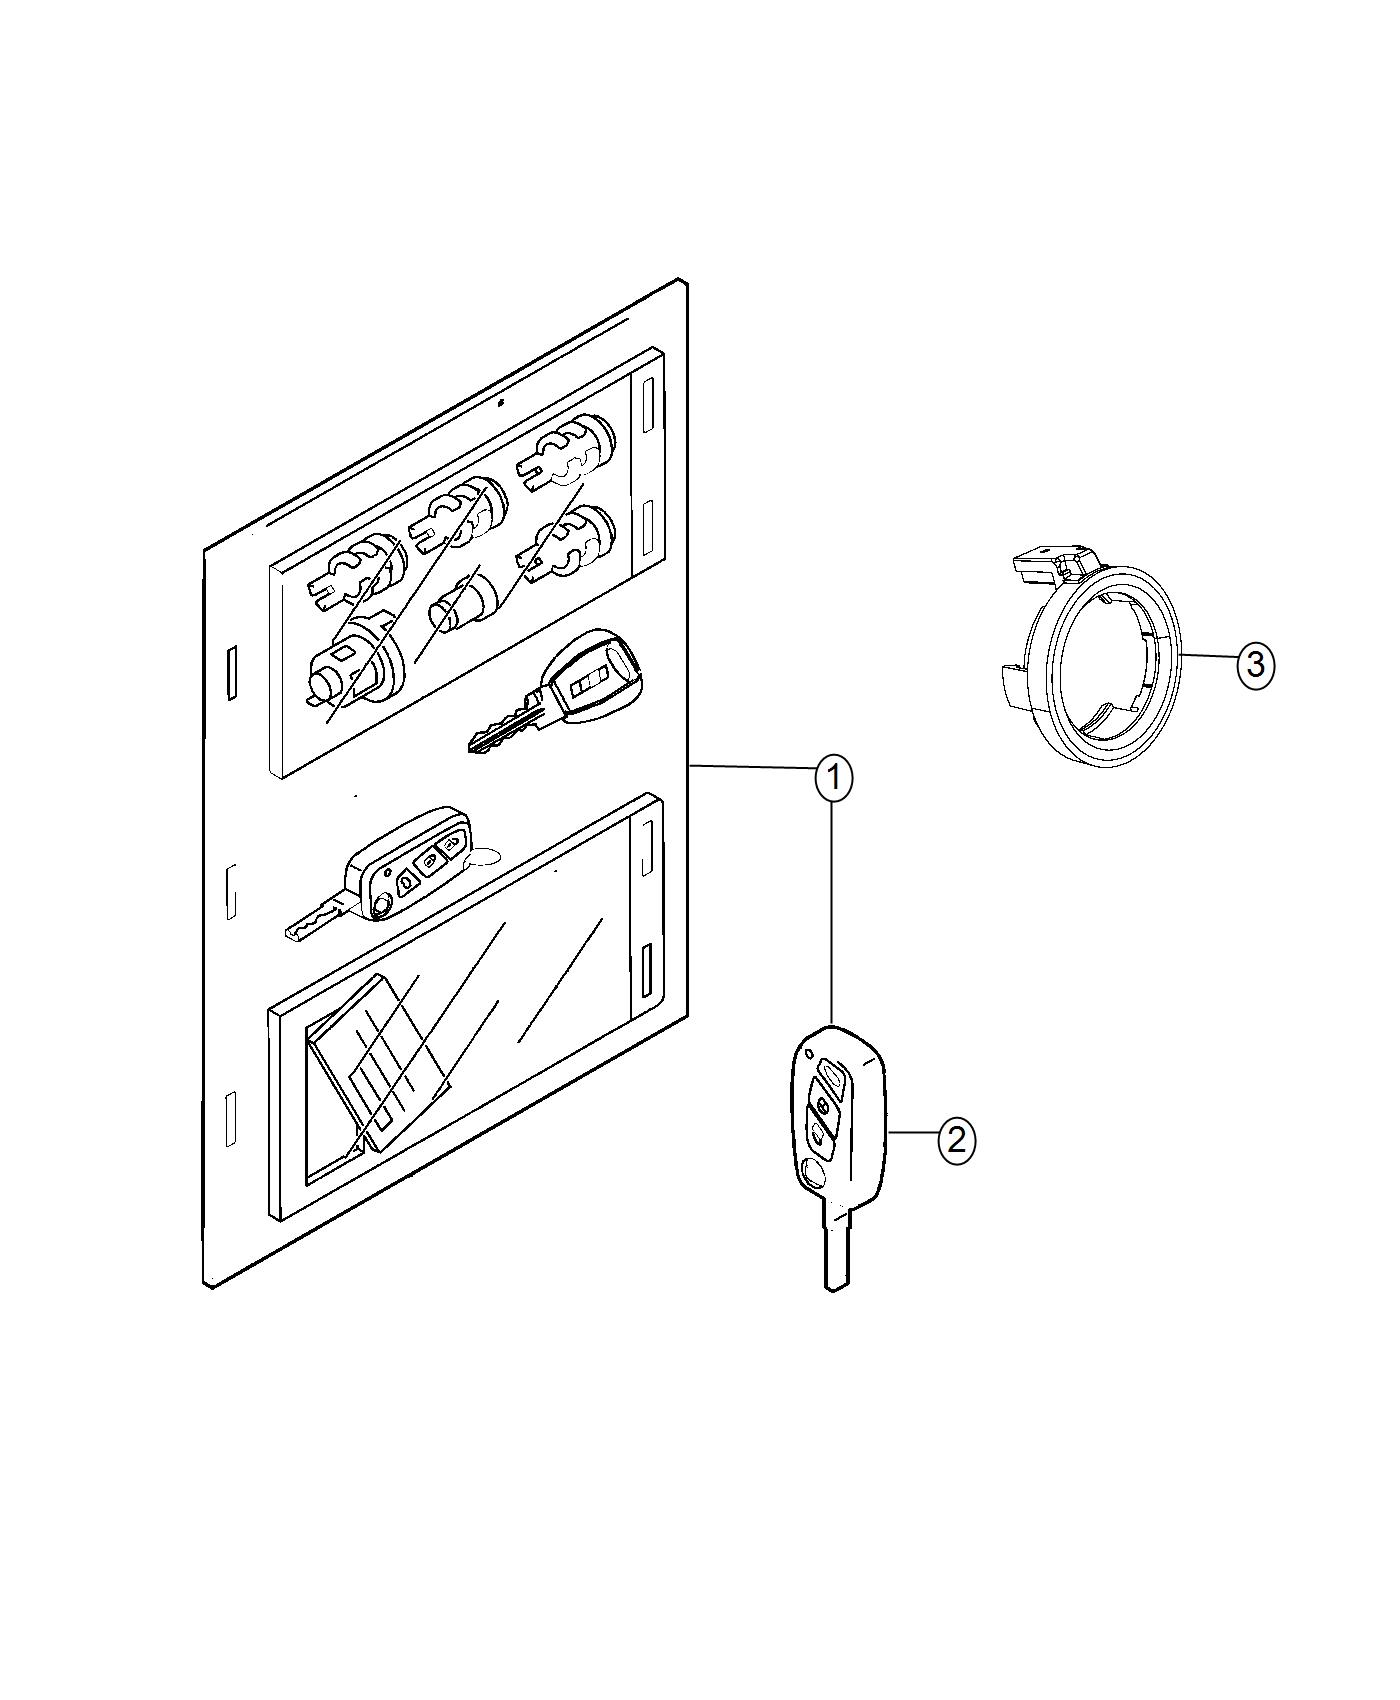 Ram Promaster City Wagon Key Blank With Transmitter